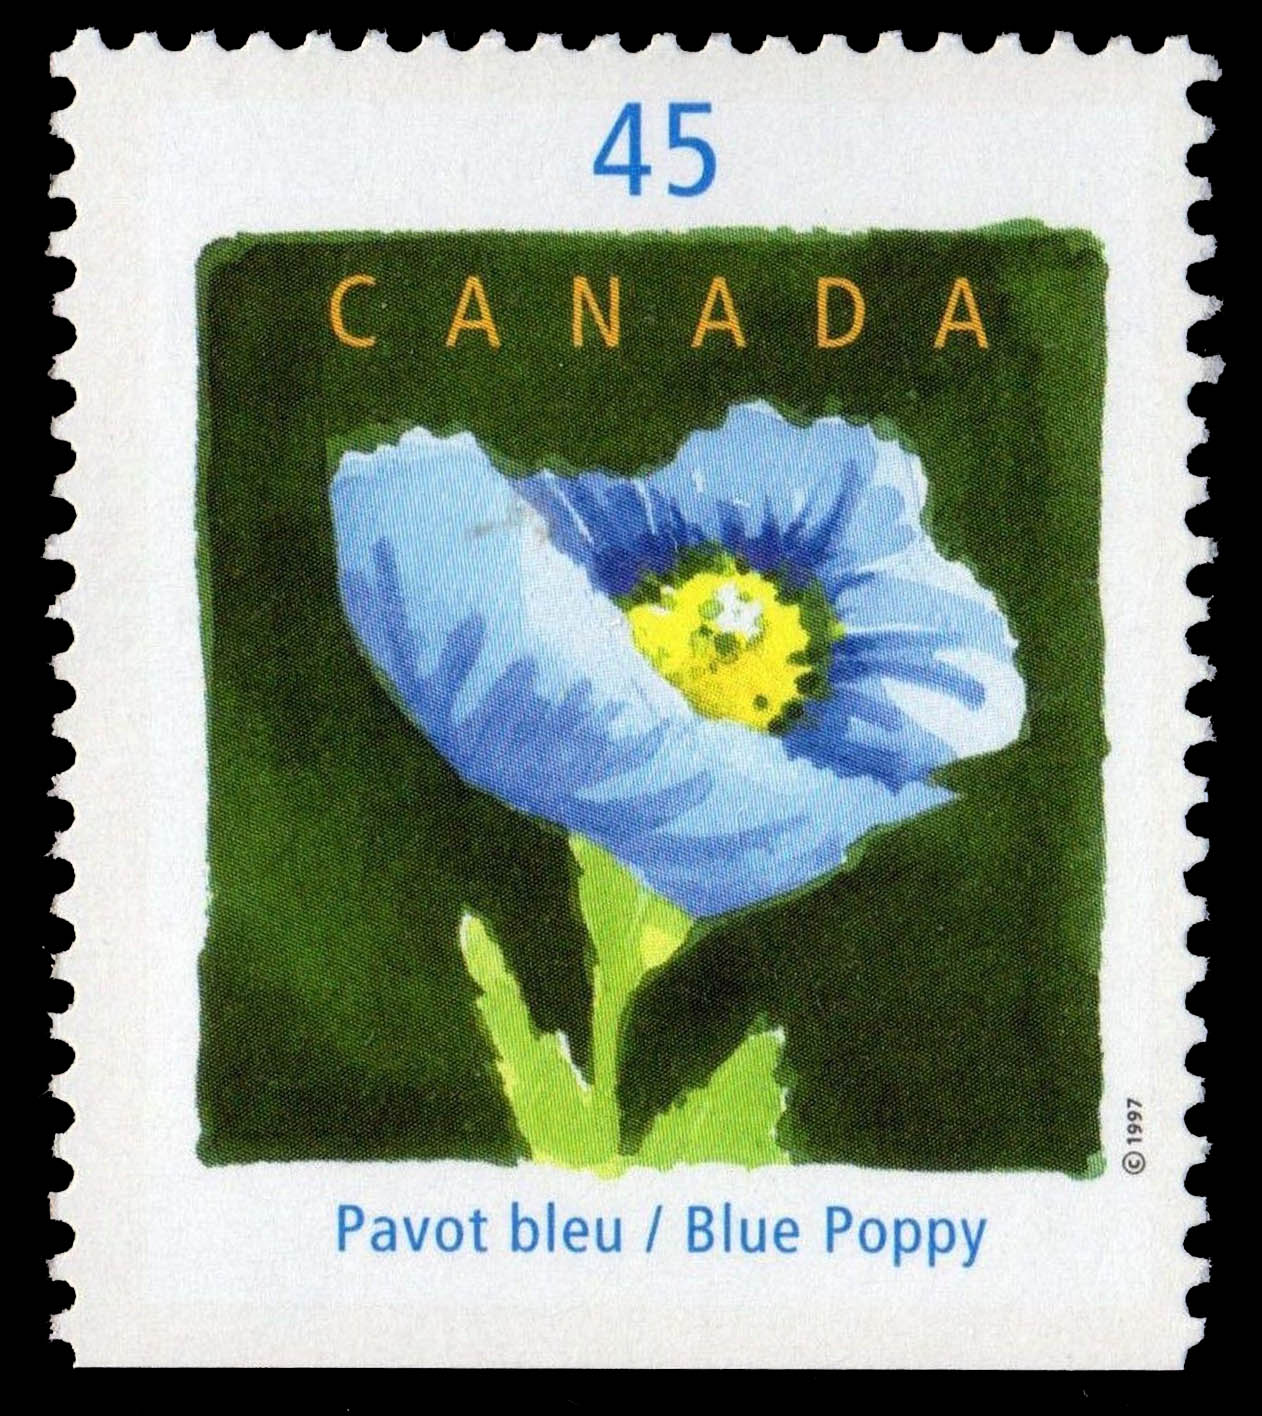 Blue Poppy - International Floral Festival Canada Postage Stamp